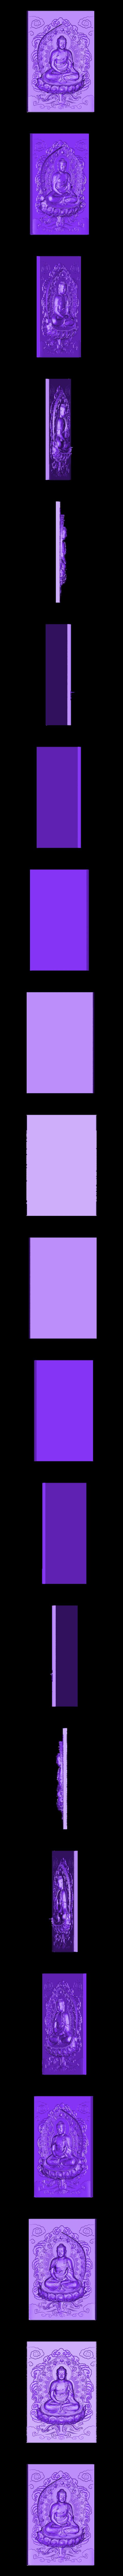 82b0bf66 3c7f 4499 ab86 a320a00edc79